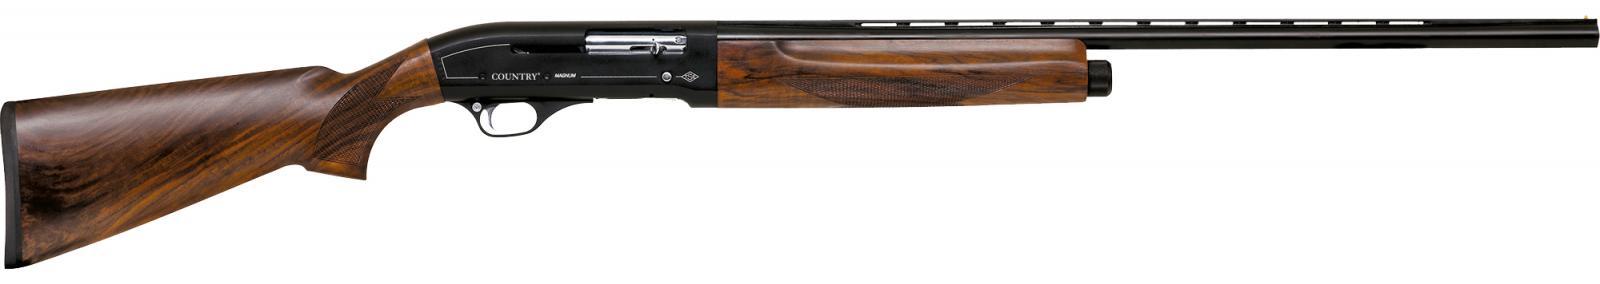 Fusil semi-auto COUNTRY MC850 Cal. 20/76